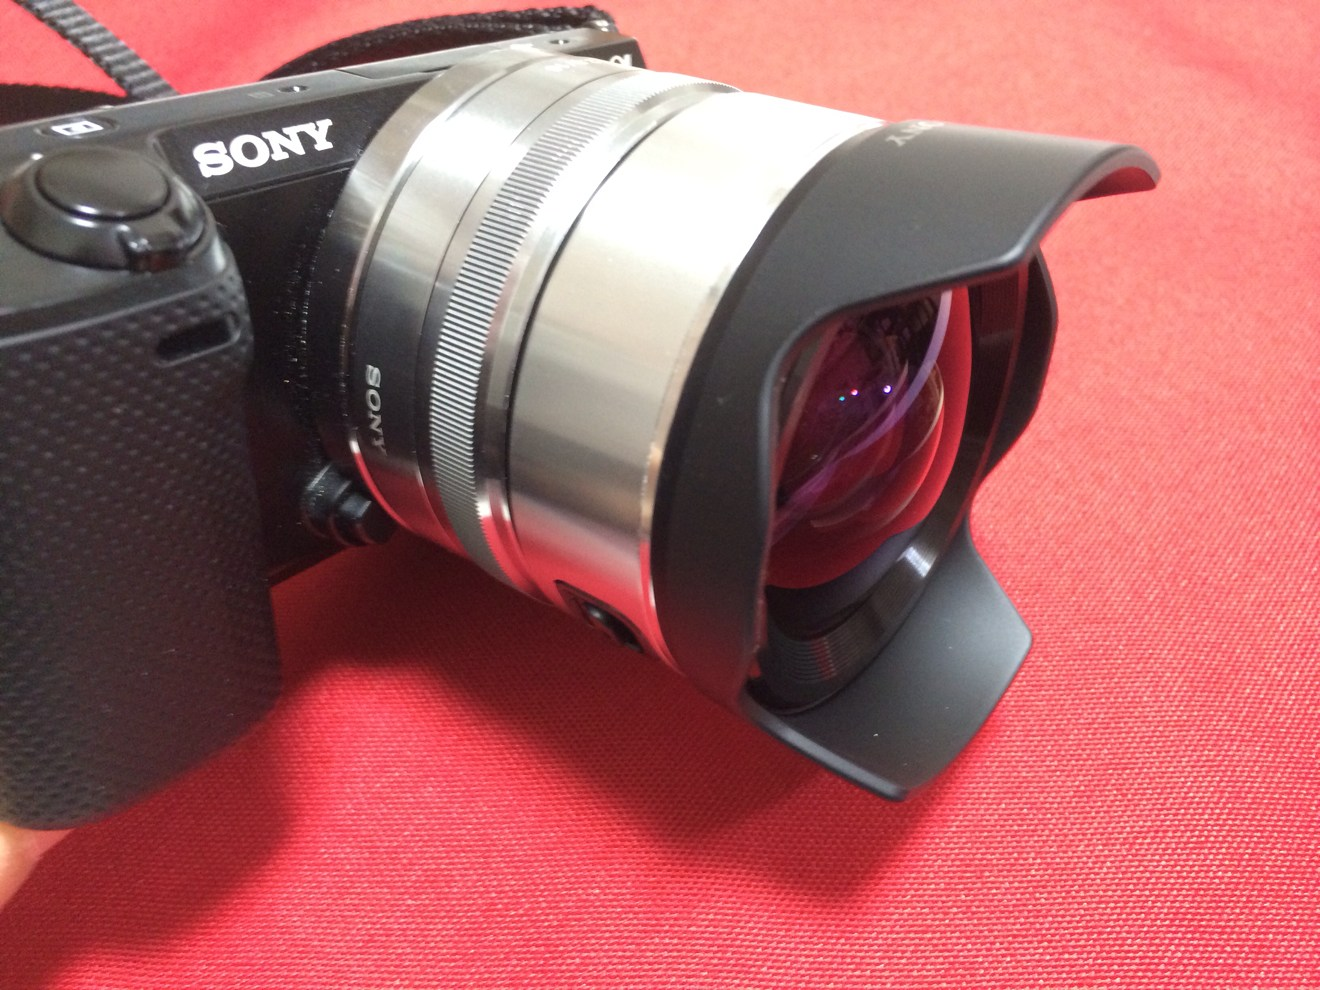 [Å] SONY NEX-5Rに薄型広角レンズ「SEL16F28」とコンバーター装着!!ワイド撮影可能に!